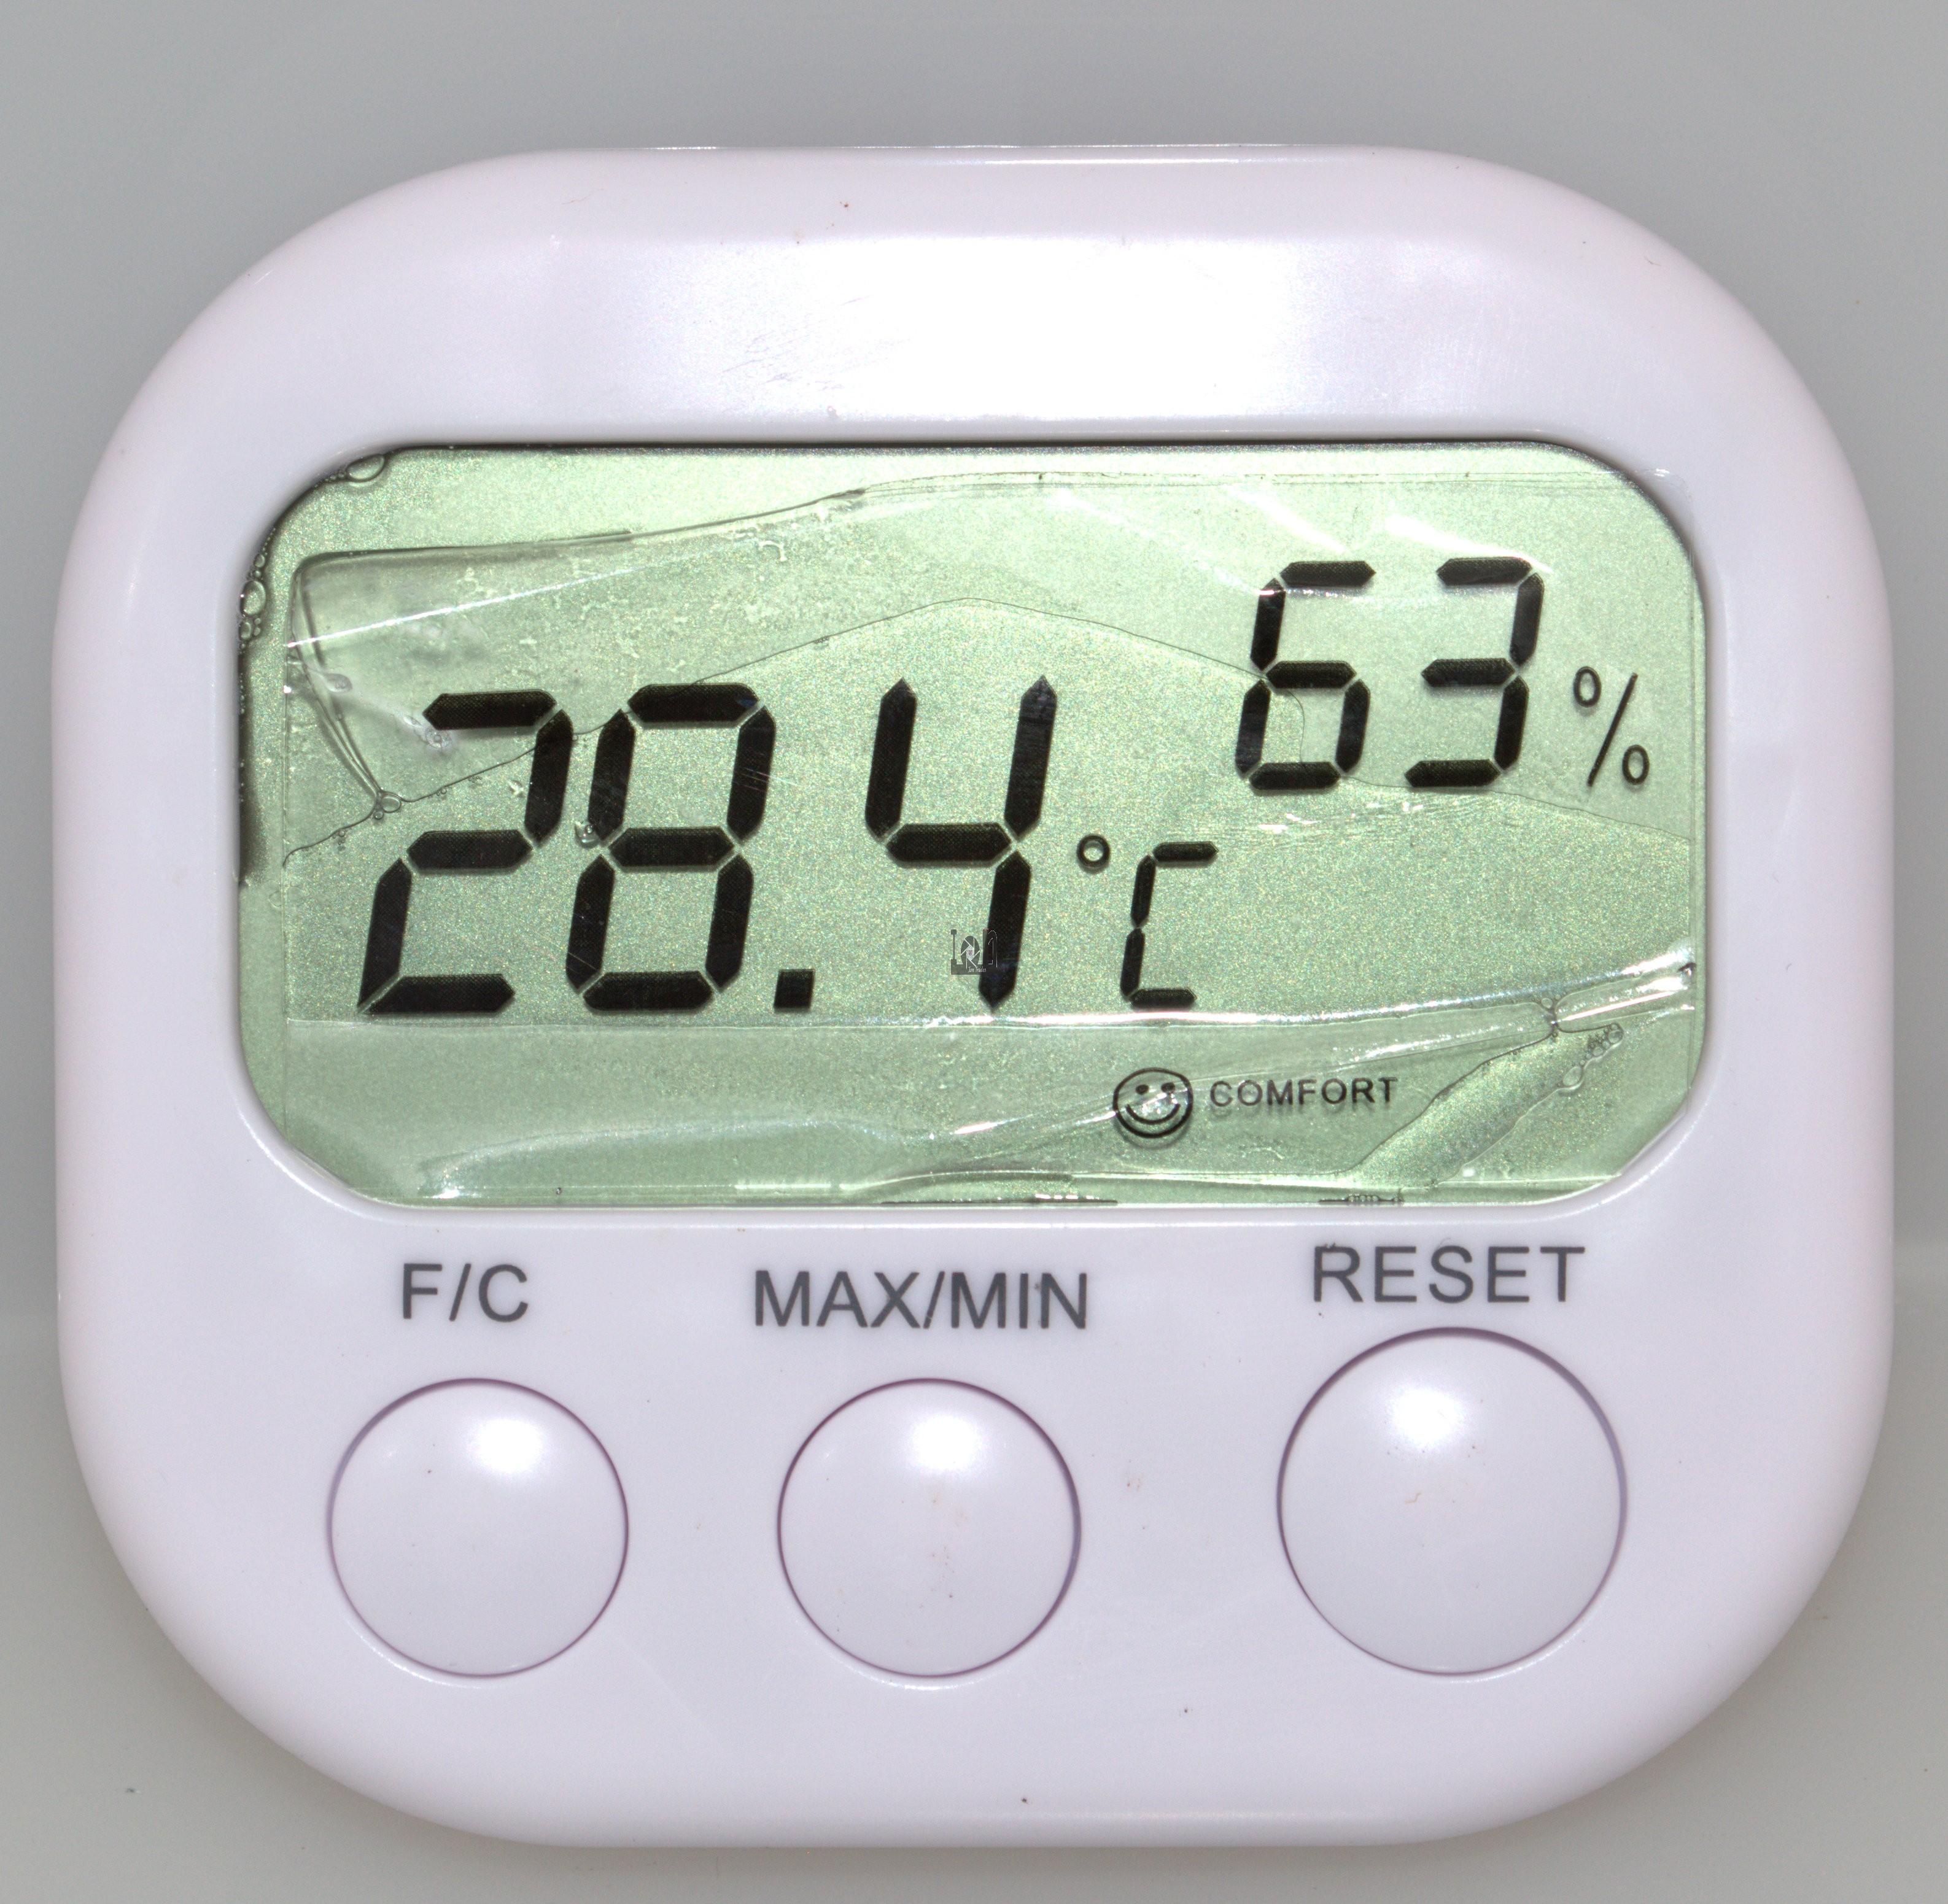 Digital LCD Thermometer Hygrometer Clock